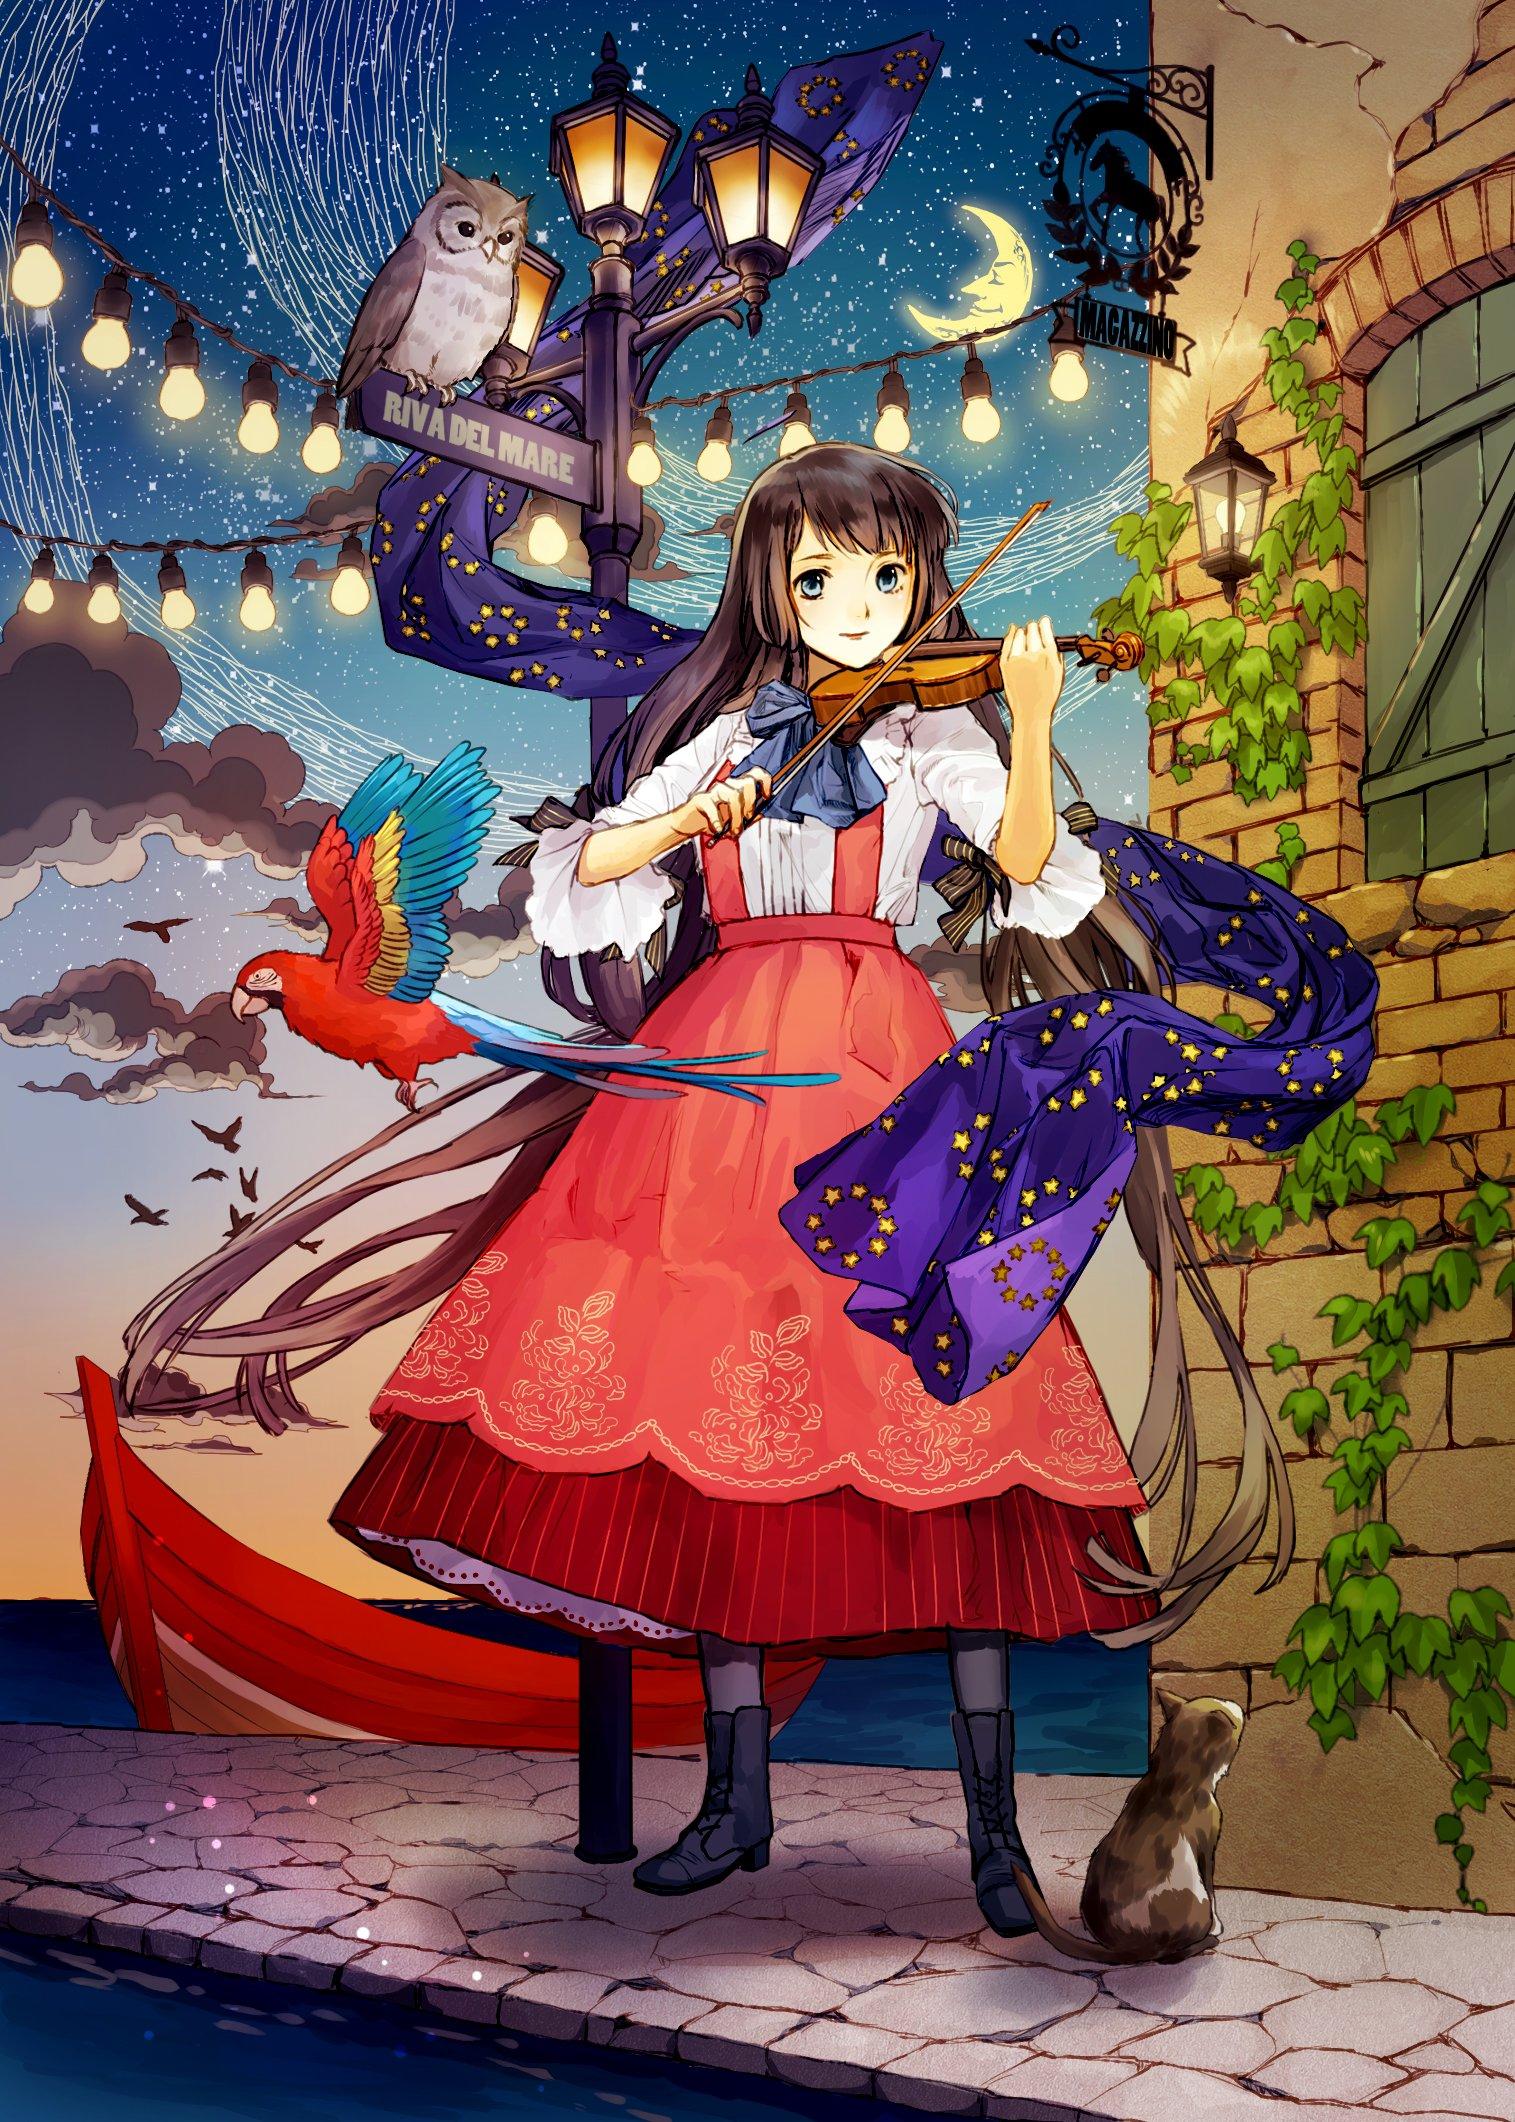 girl blue eyes hair long brown Anime